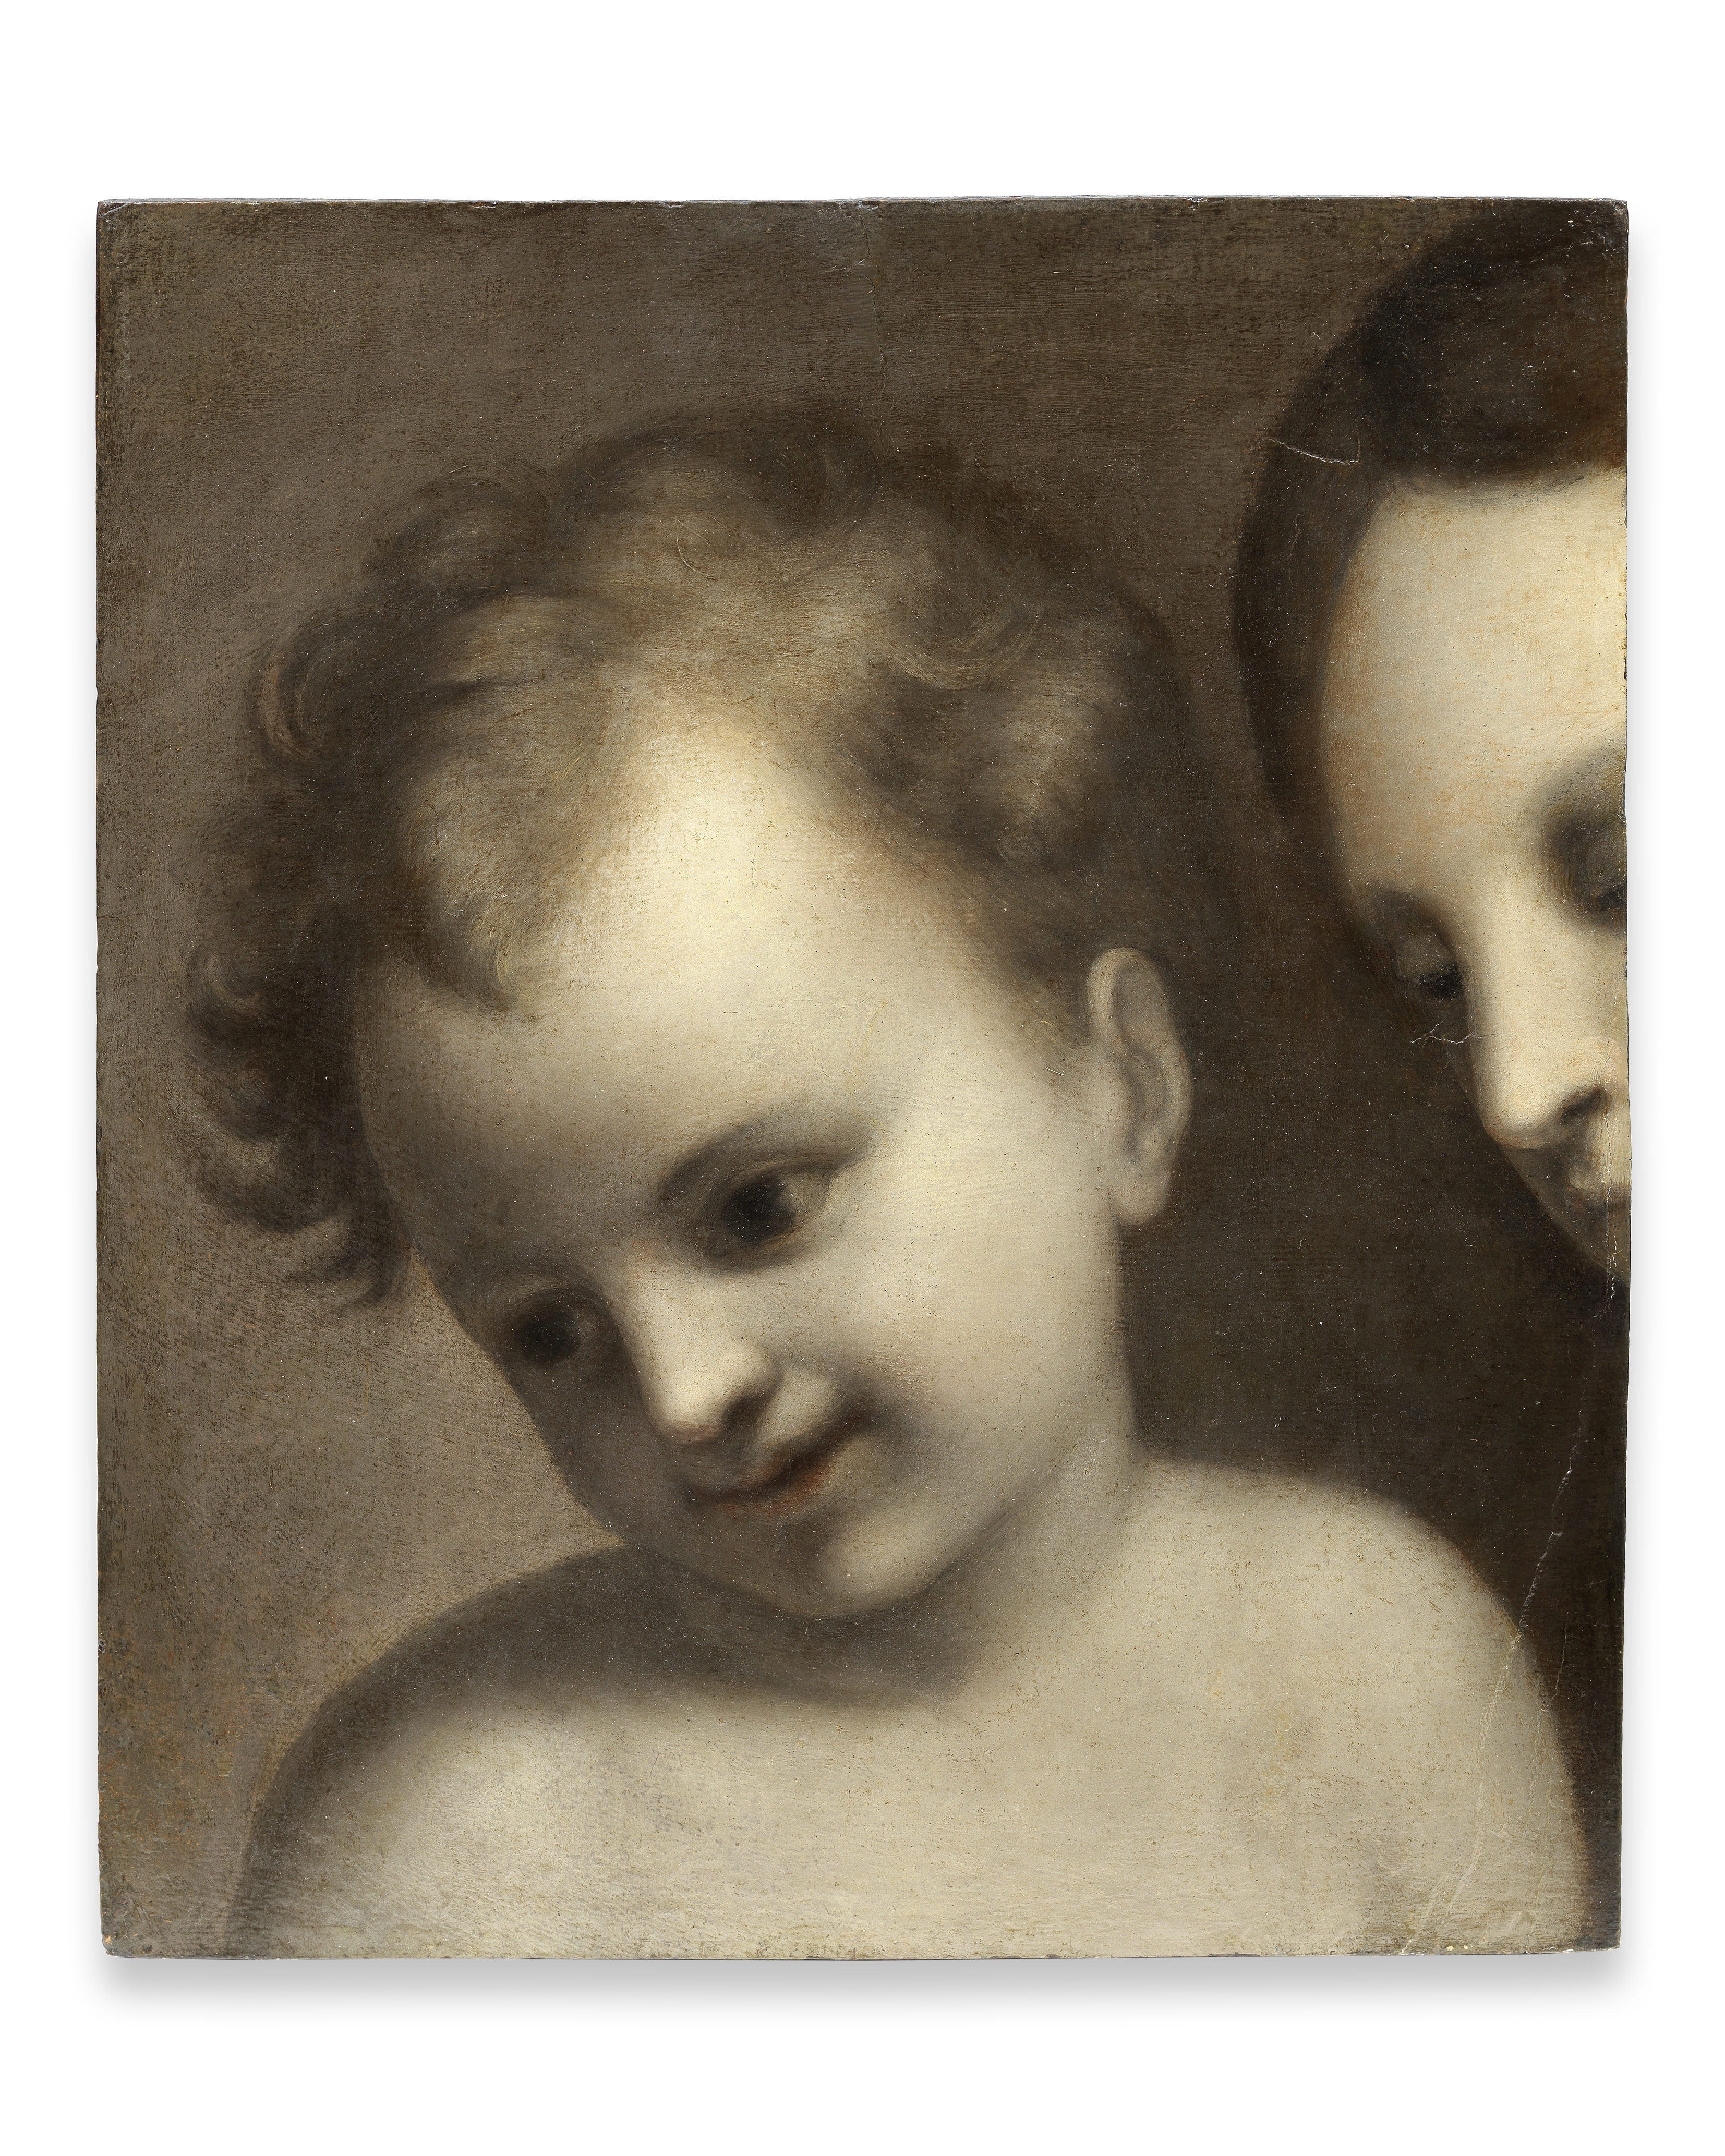 Emilian School, late 16th Century The Christ Child unframed